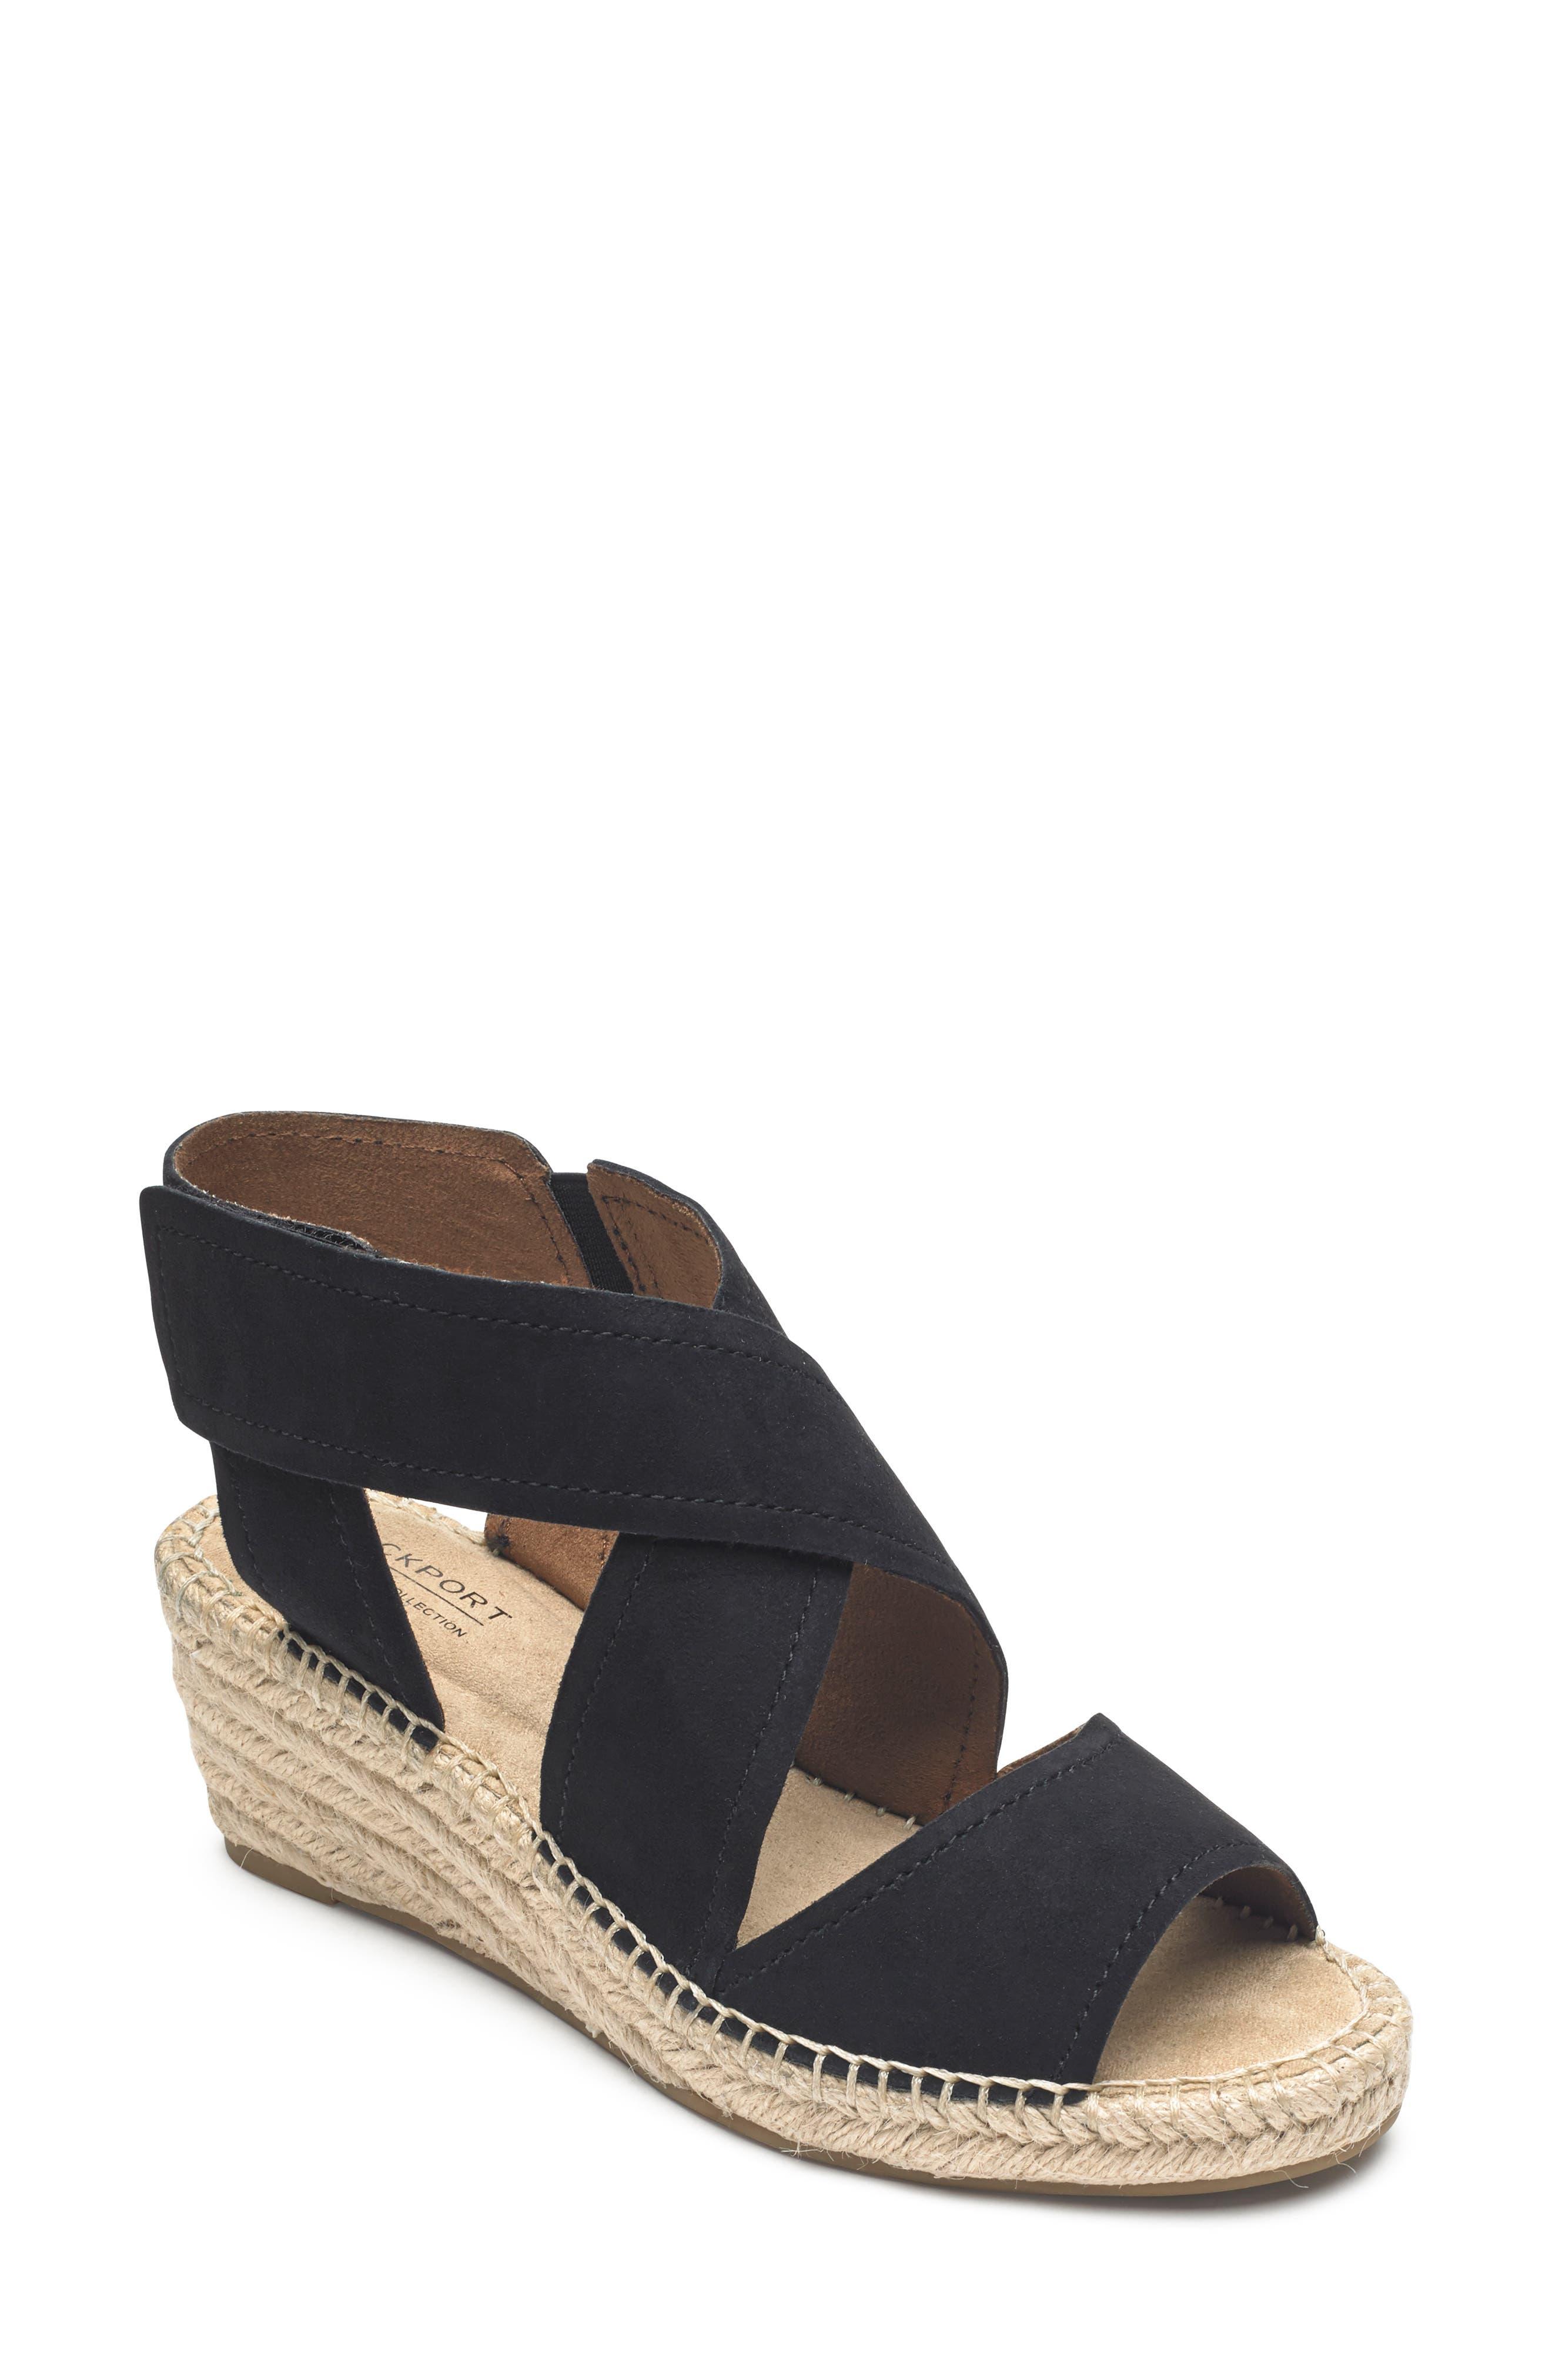 ROCKPORT COBB HILL Kairi Wedge Sandal, Main, color, BLACK SUEDE